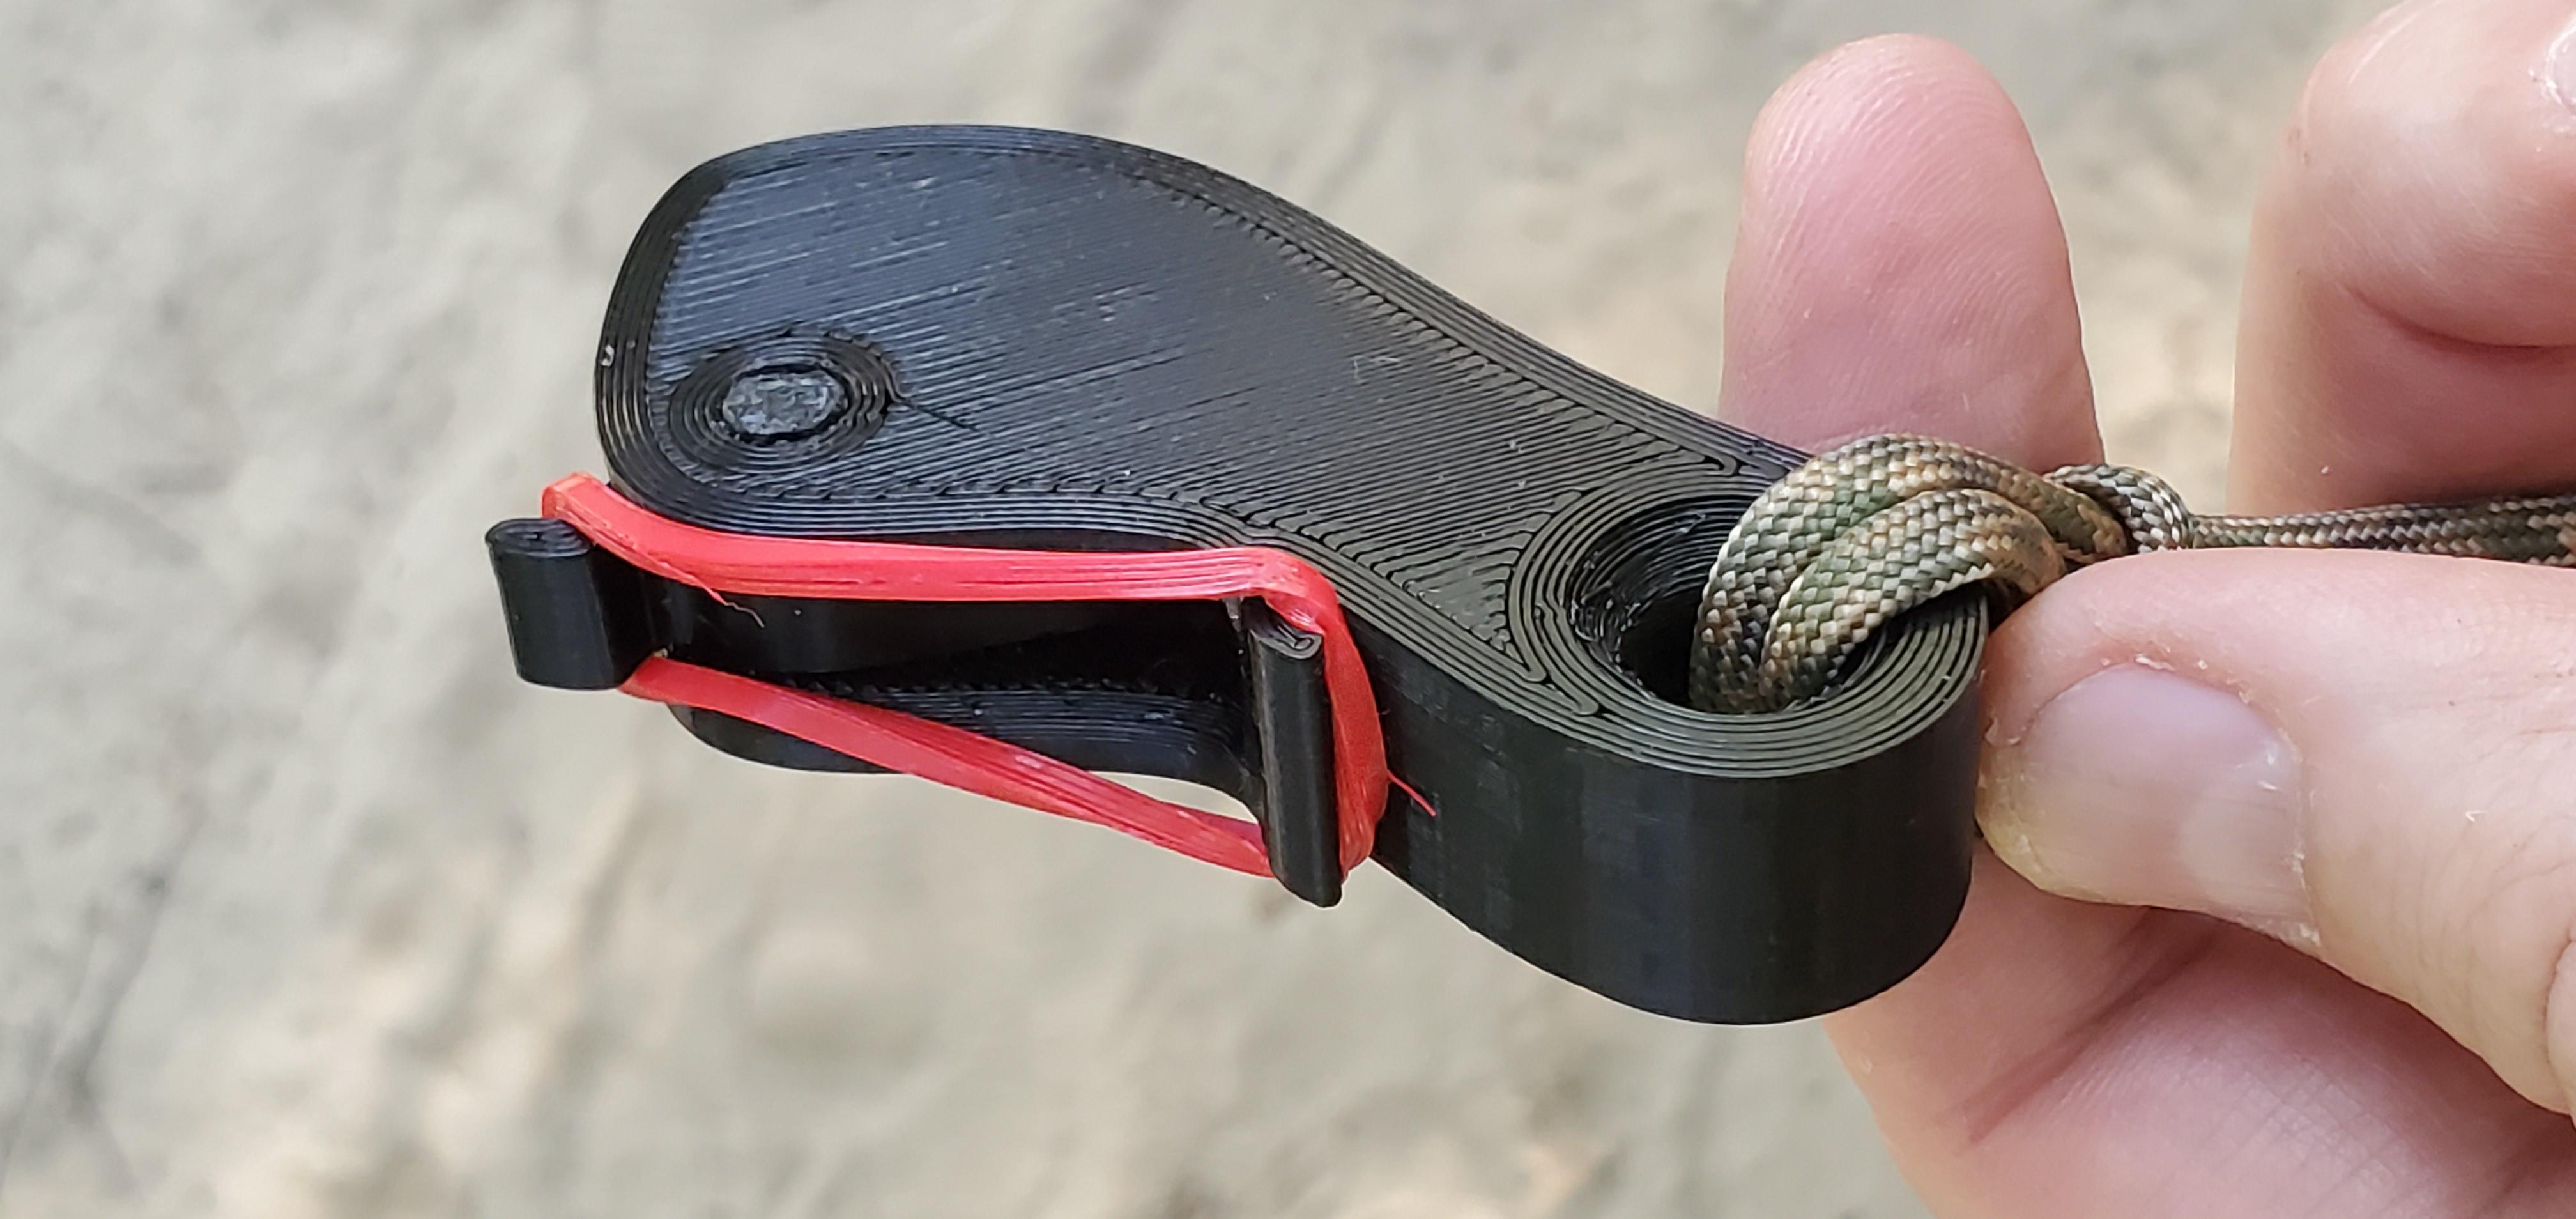 20190717_172101.jpg Download free STL file Rope tensioner (cam) fully printed • 3D printing object, dvilleneuve